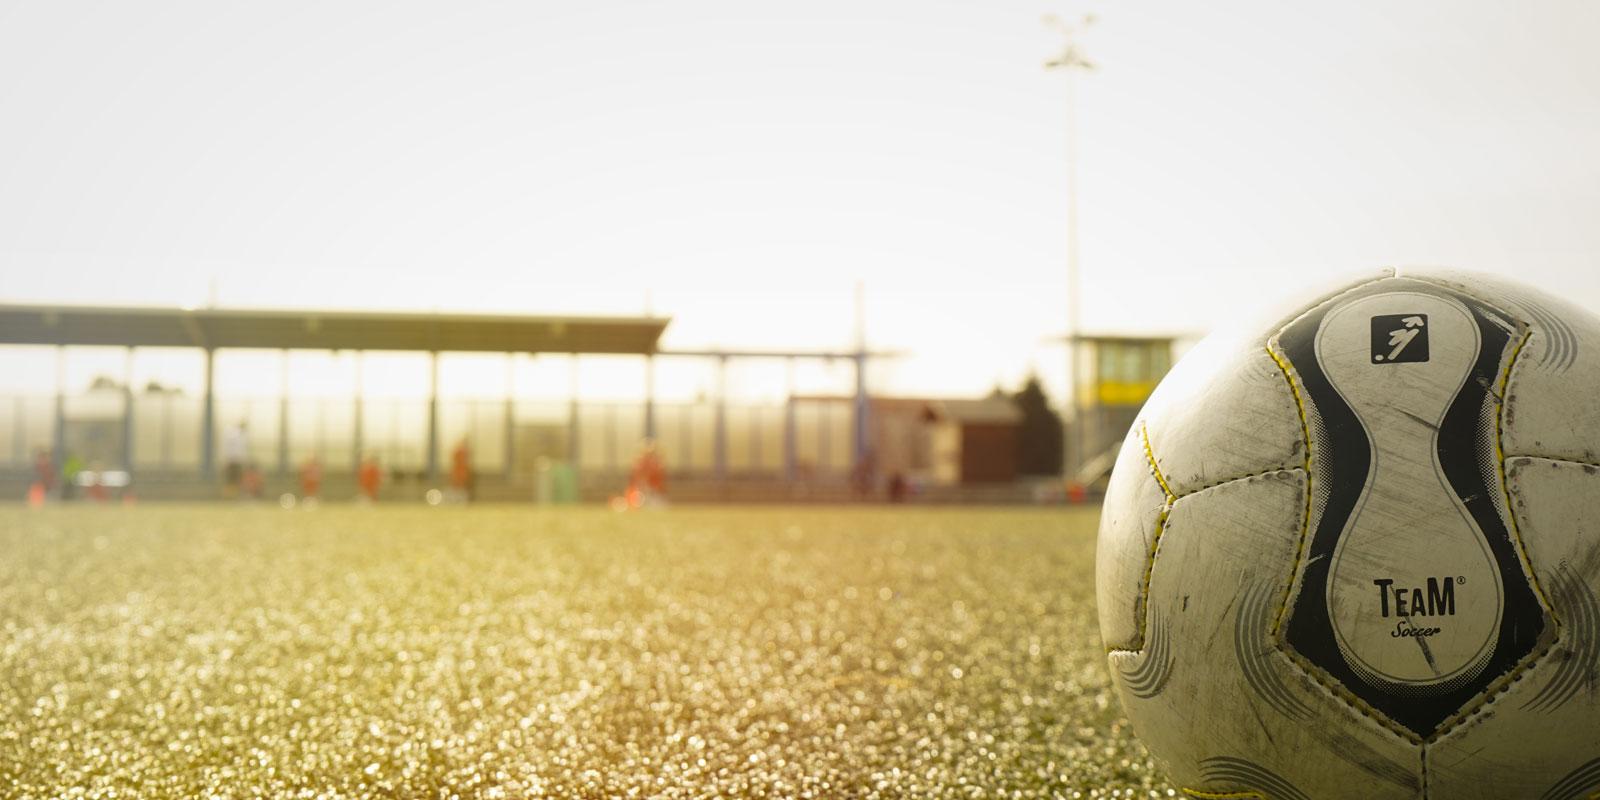 Fußball-Feriencamps Team Soccer Vereinstraining